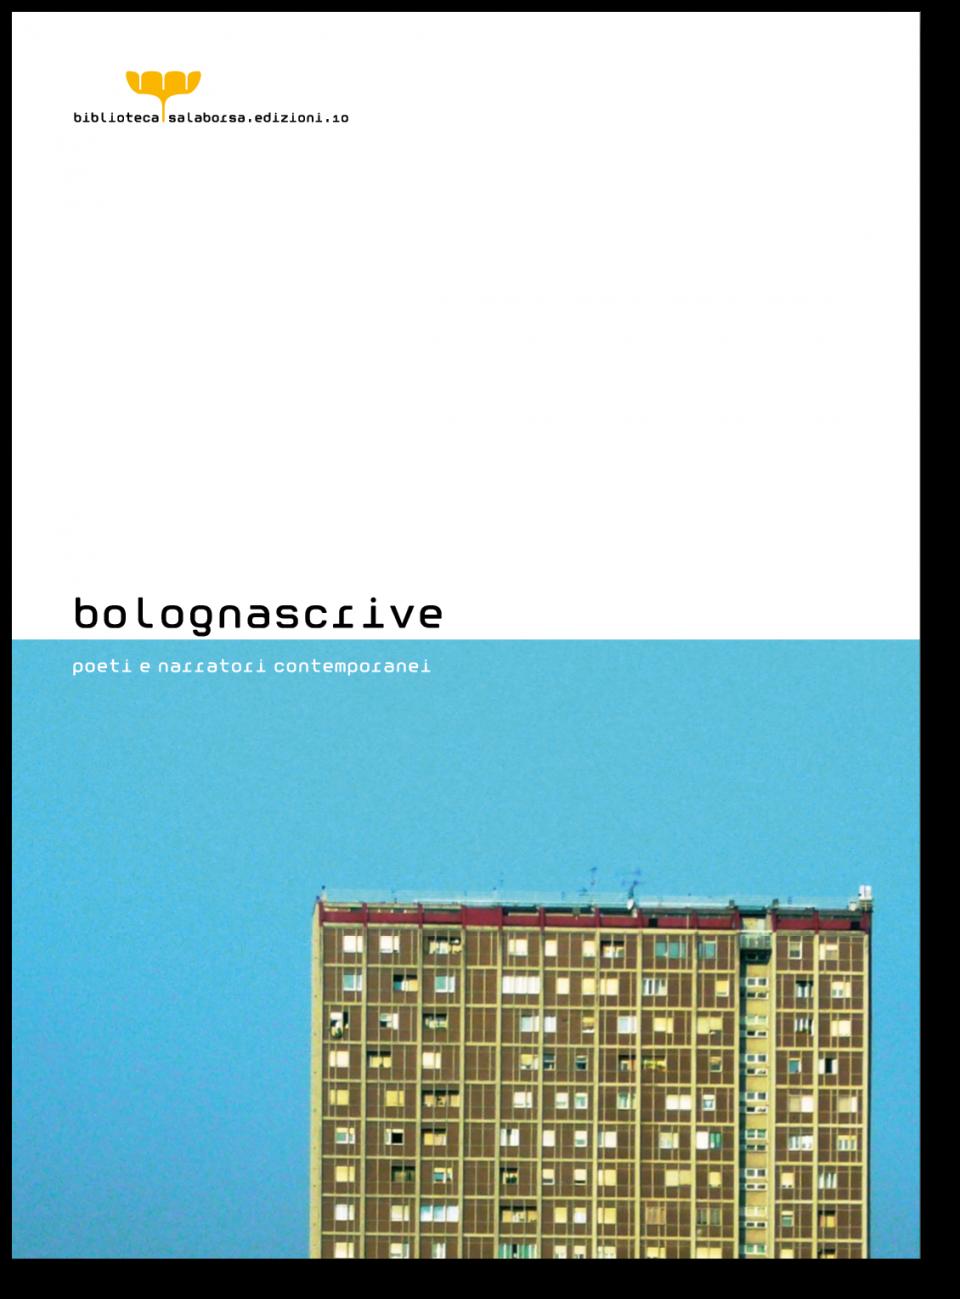 bsb_03.png